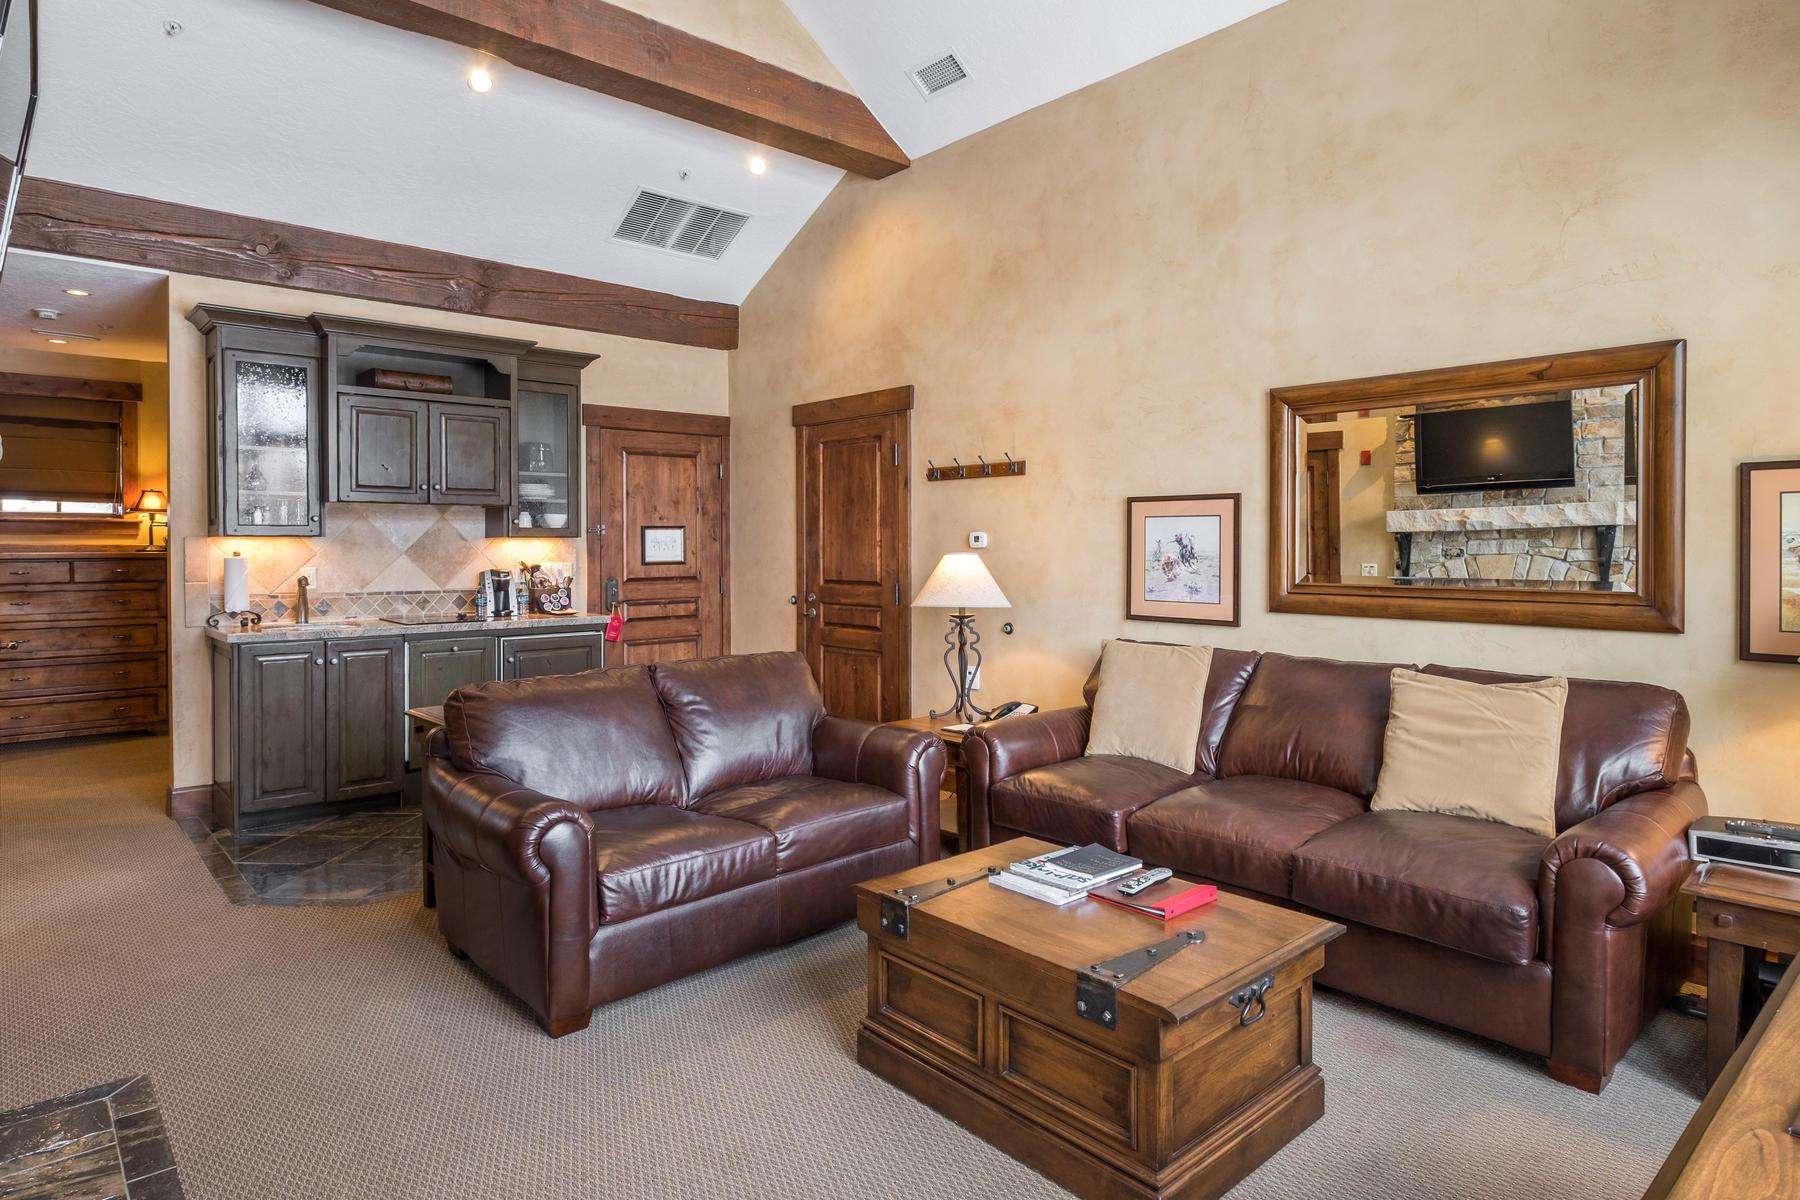 共管物業 為 出售 在 Gorgeous Cottage Suite at Hotel Park City 2001 Park Ave #466, Park City, 猶他州, 84060 美國